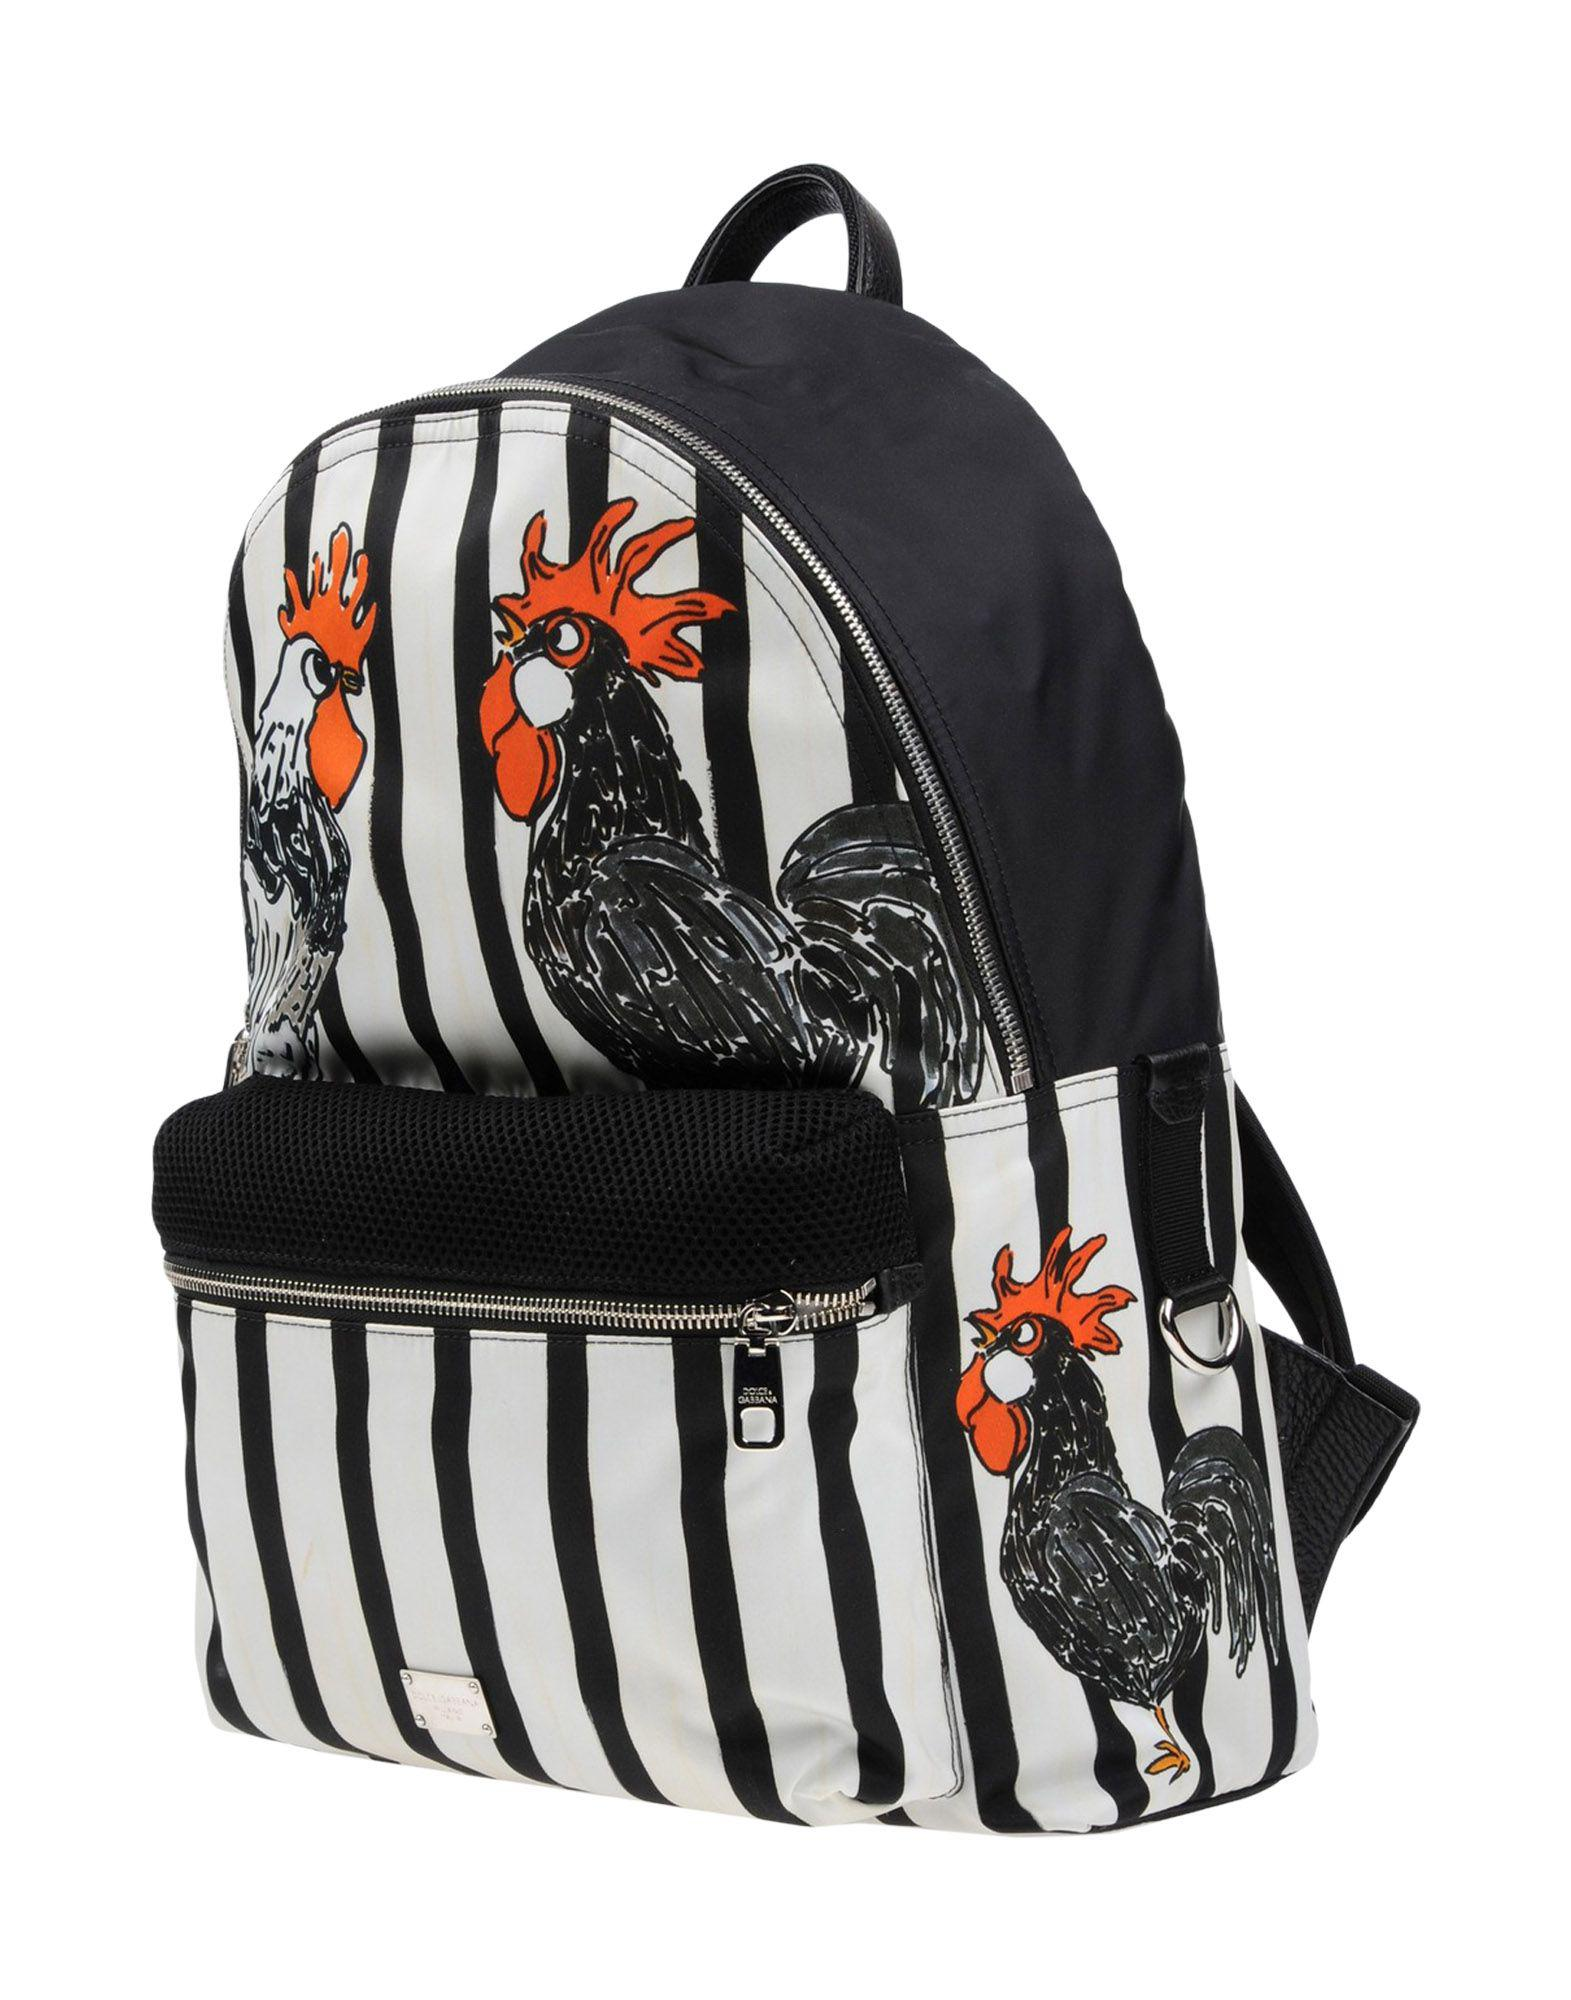 BAGS - Backpacks & Bum bags Dolce & Gabbana MpEf0